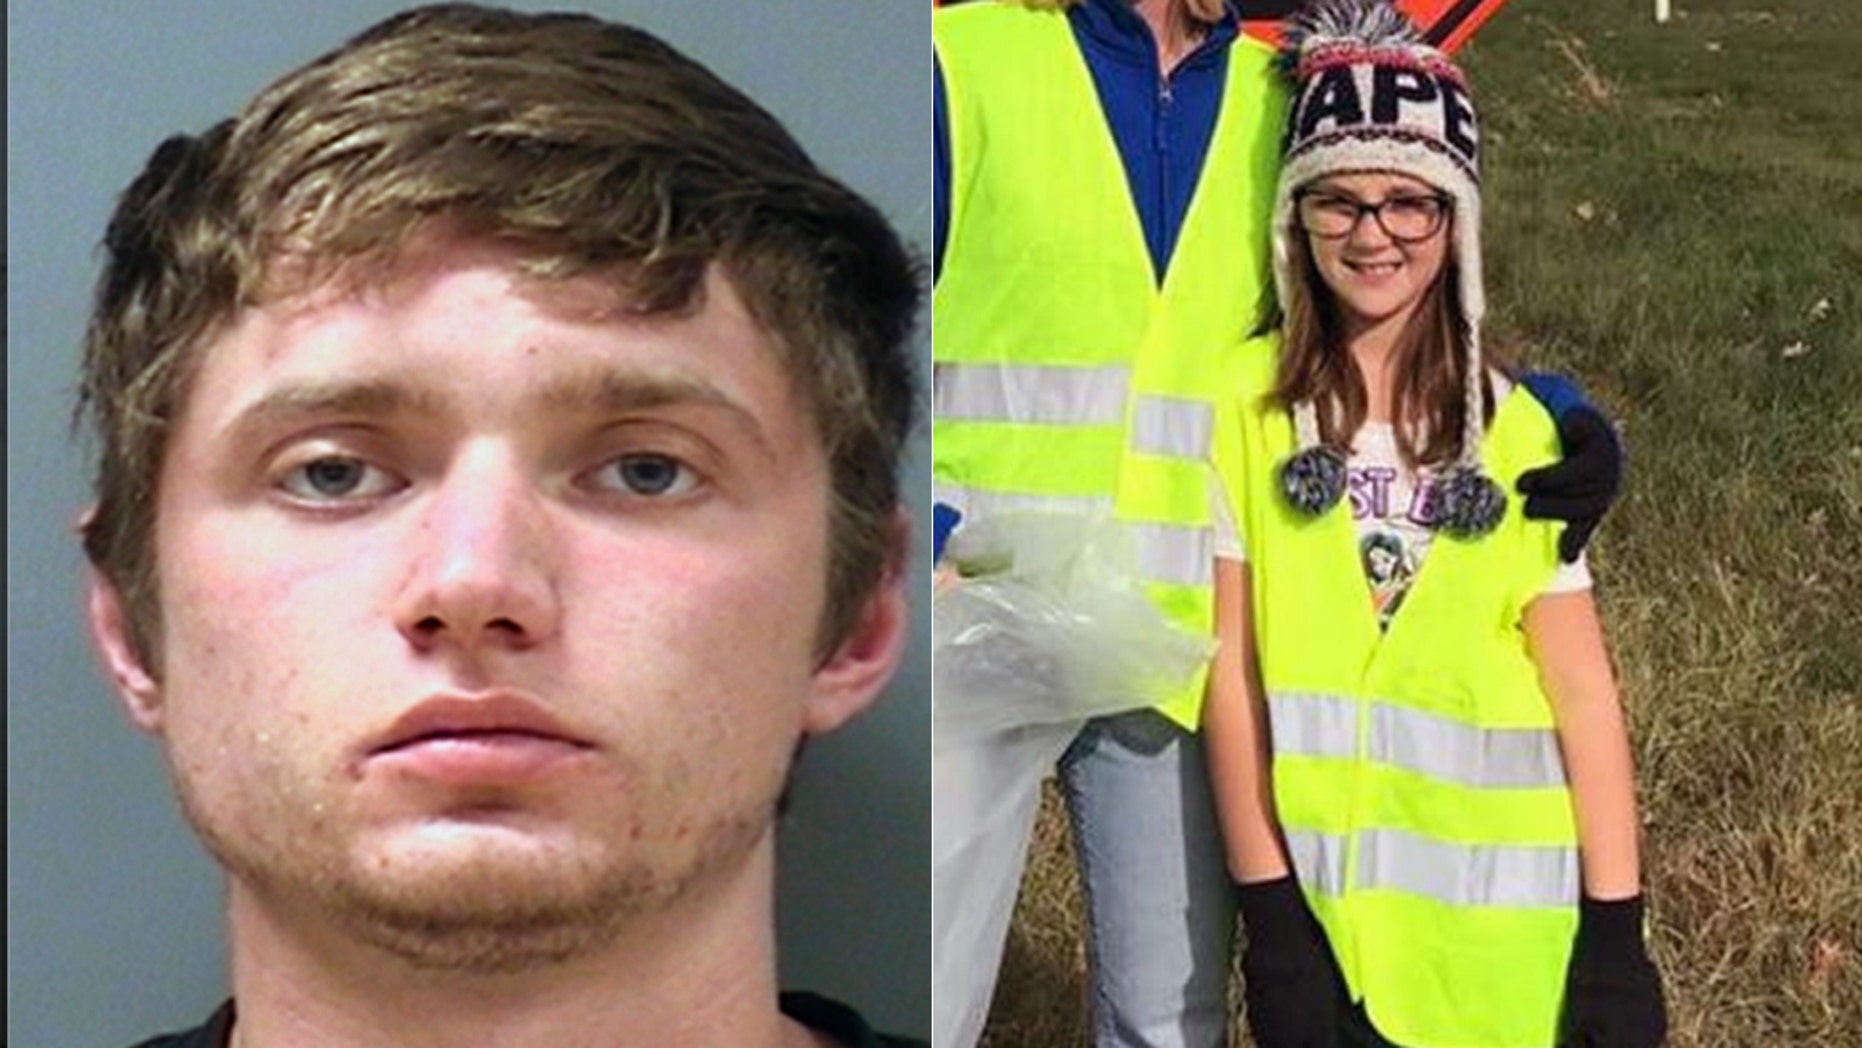 Colton Treu, left and victim Jayna Kelley